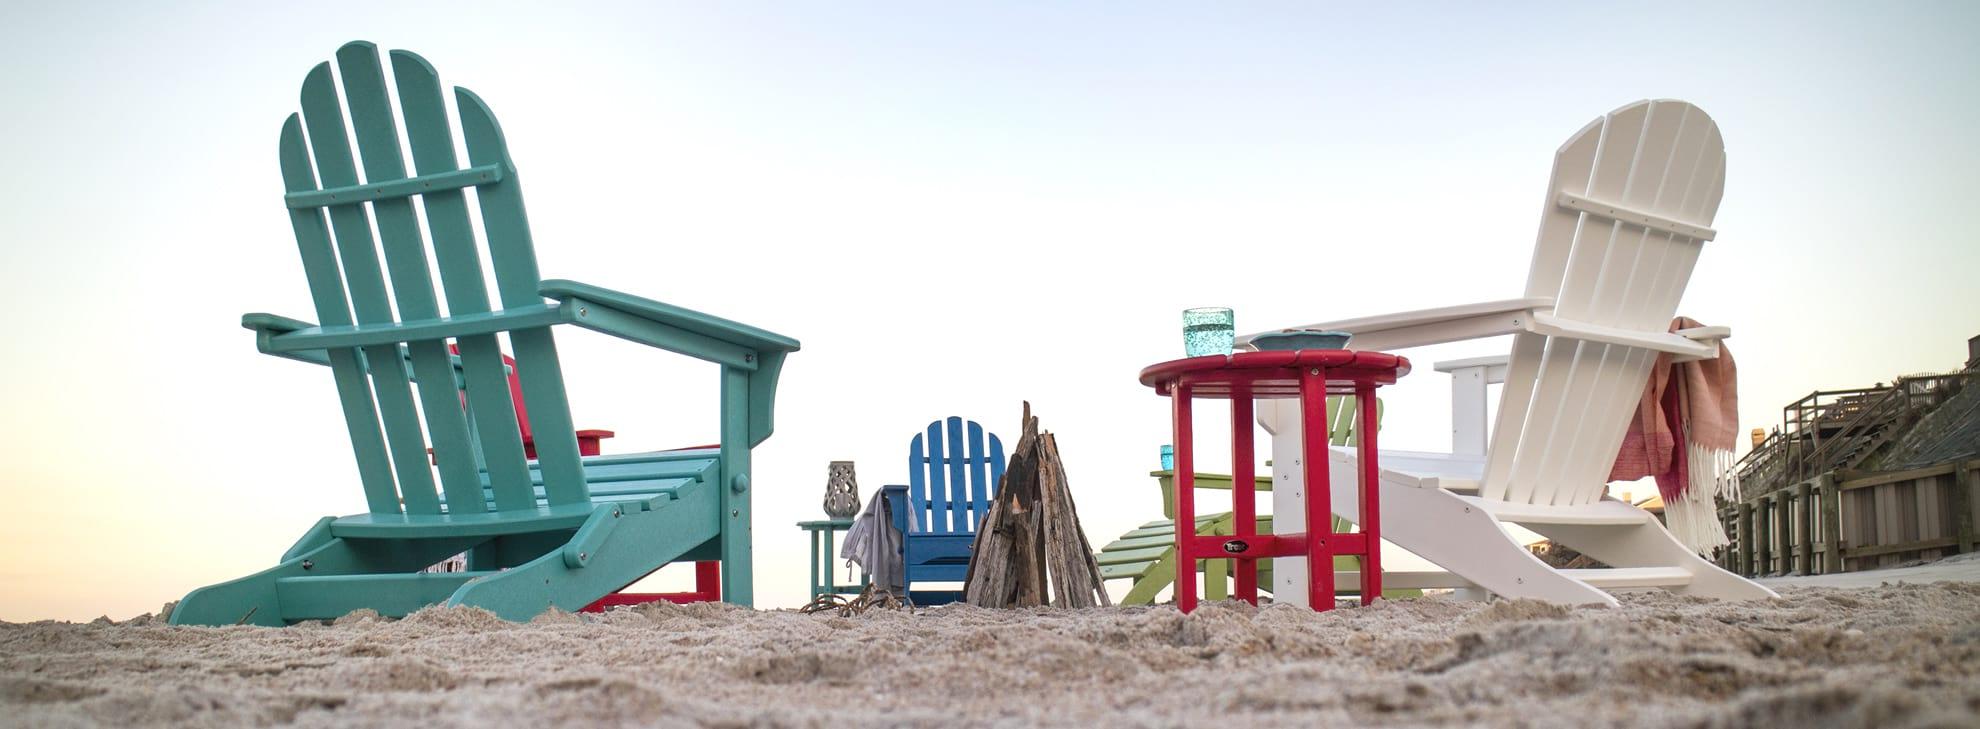 Adirondack Chairs on a beach